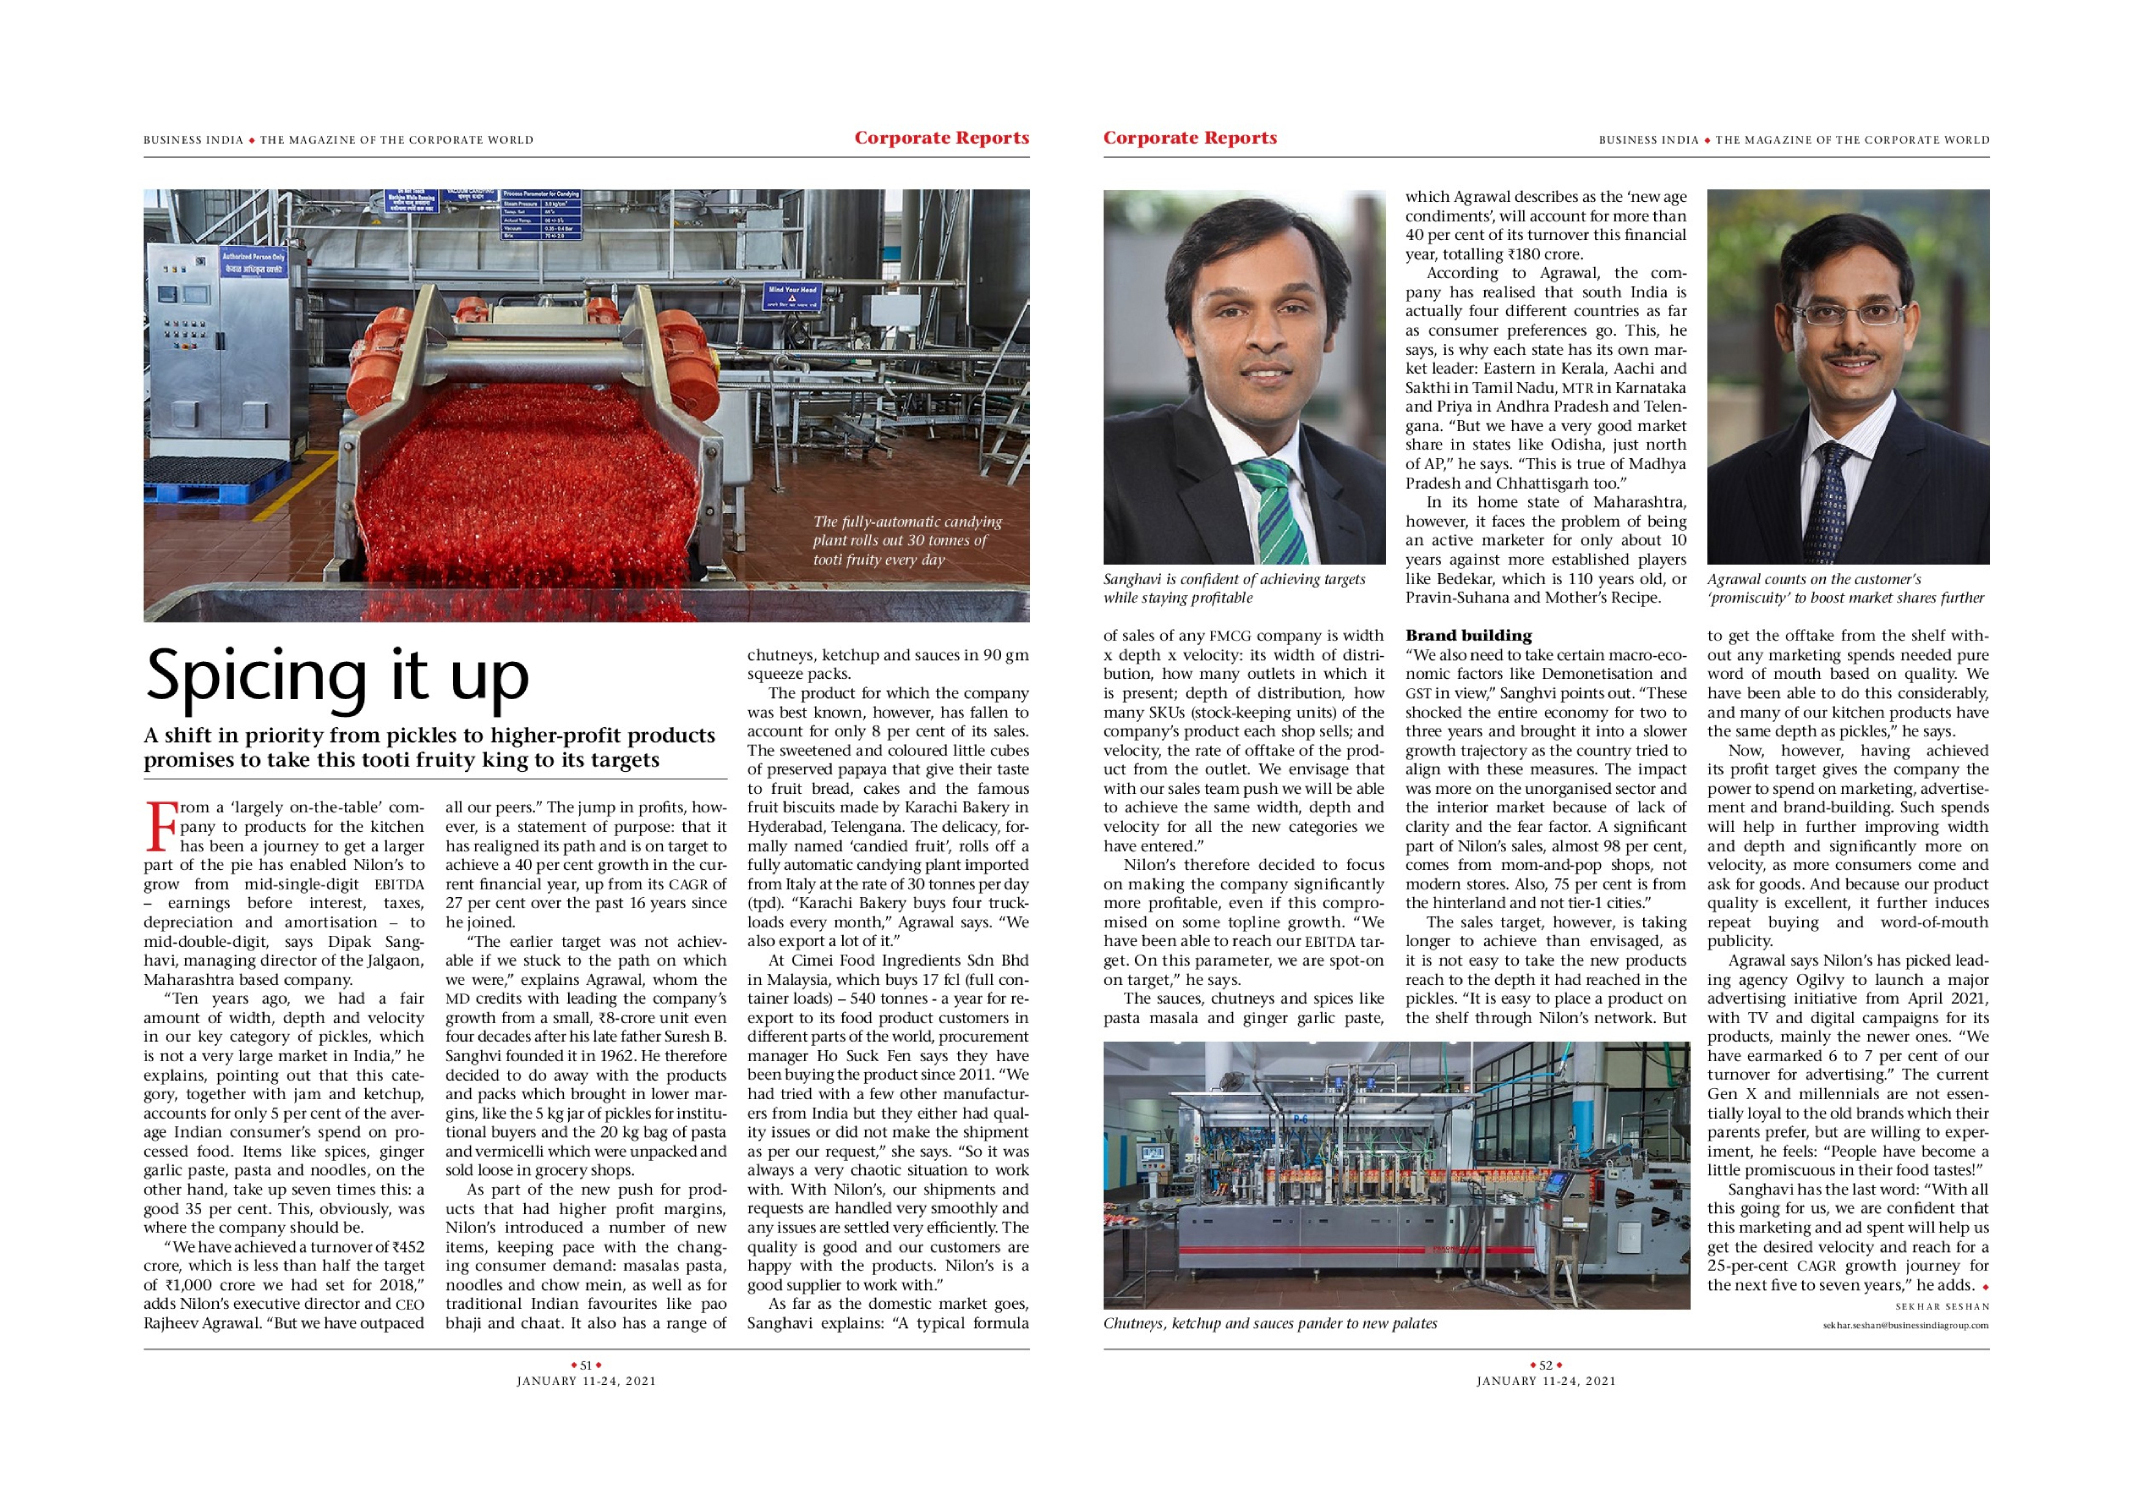 Mr. Dipak Sanghavi and Mr. Rajheev Agrawal on transforming Nilon's